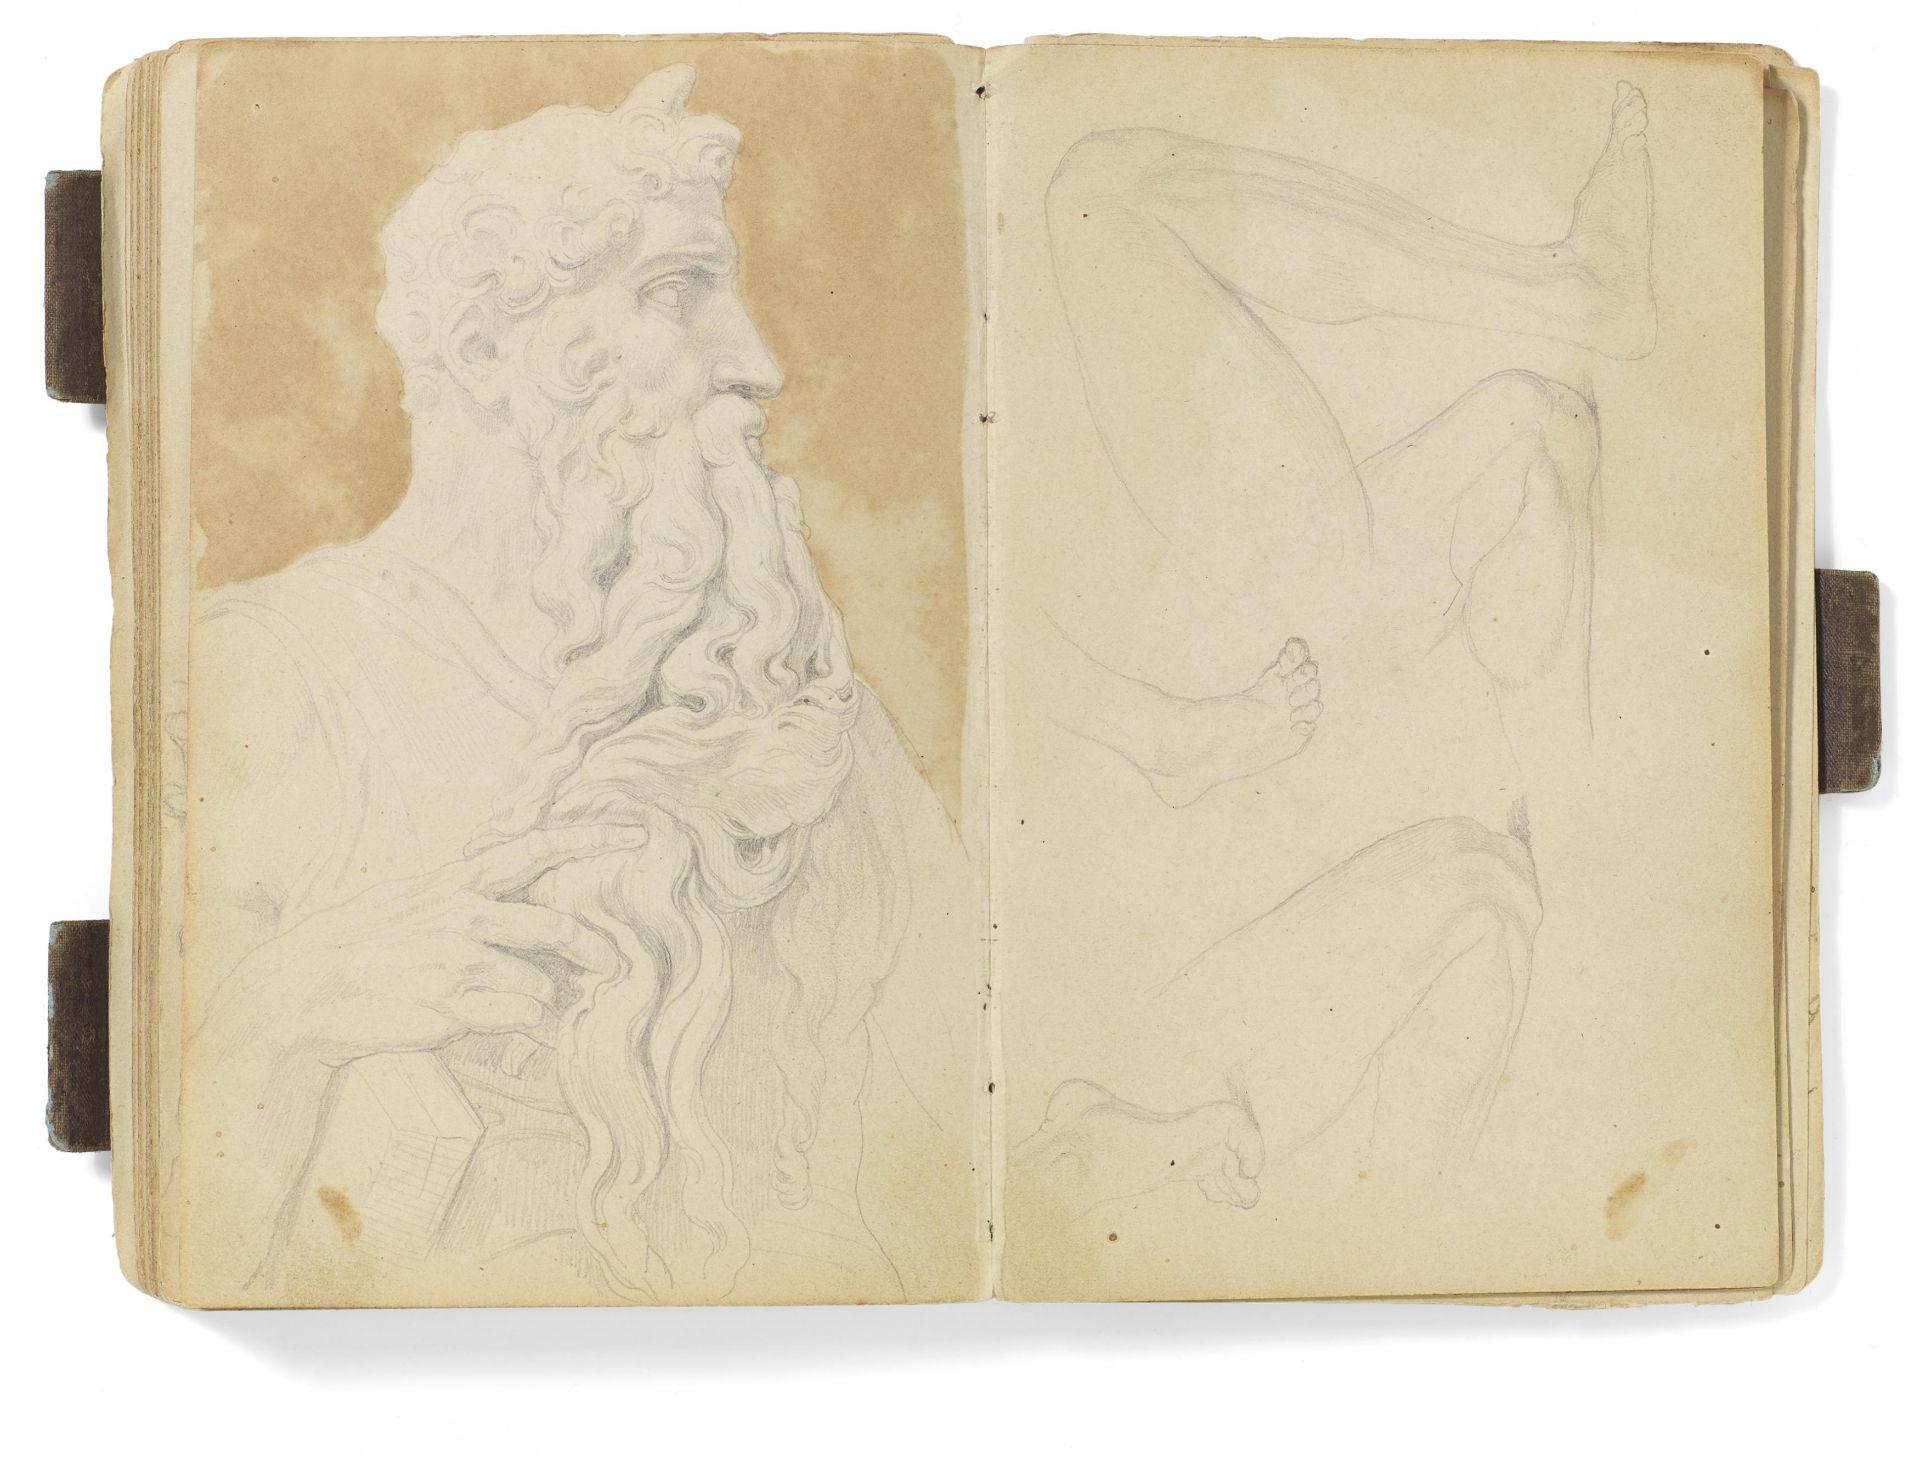 Kaupert, Gustav Kassel 1819 - 1897  Sketchbook, ca. 50 pages. Architecture, Italian landscapes - Bild 6 aus 6